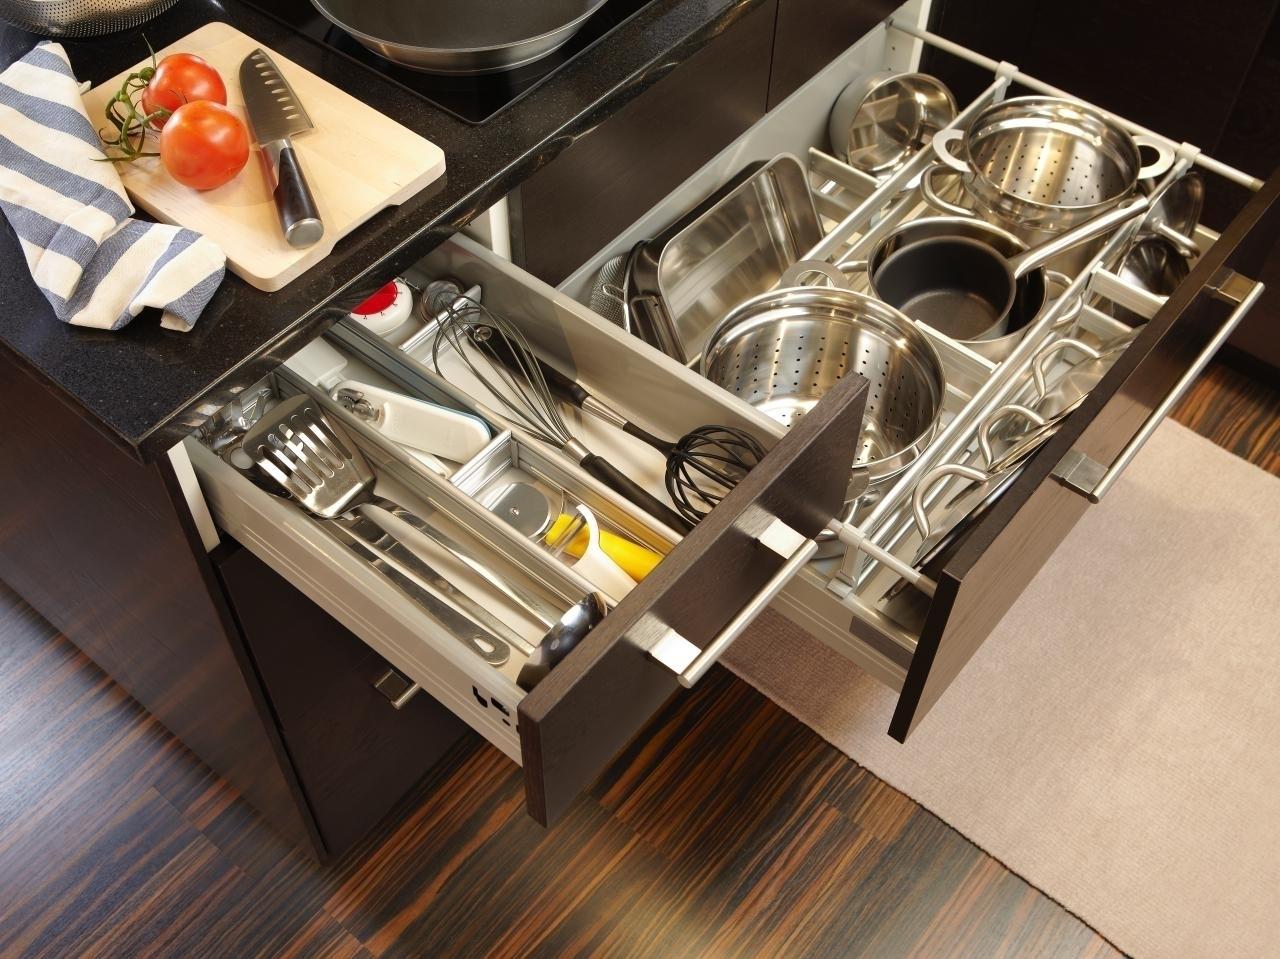 Accessori Per La Cucina Ikea